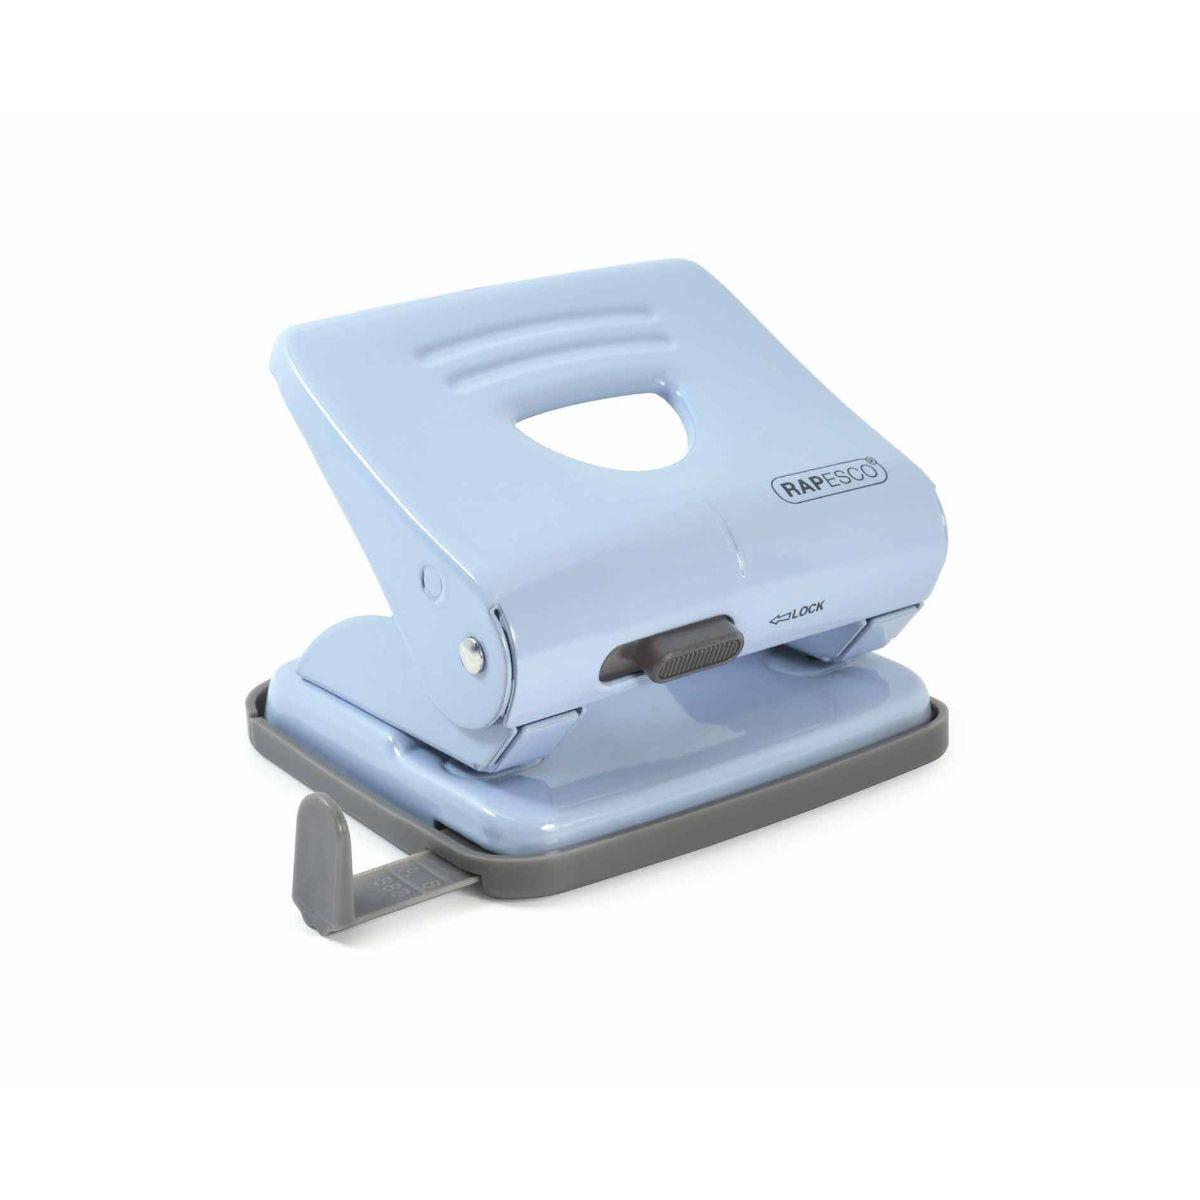 Rapesco 825 2 Hole Punch 25 Sheet Capacity Blue